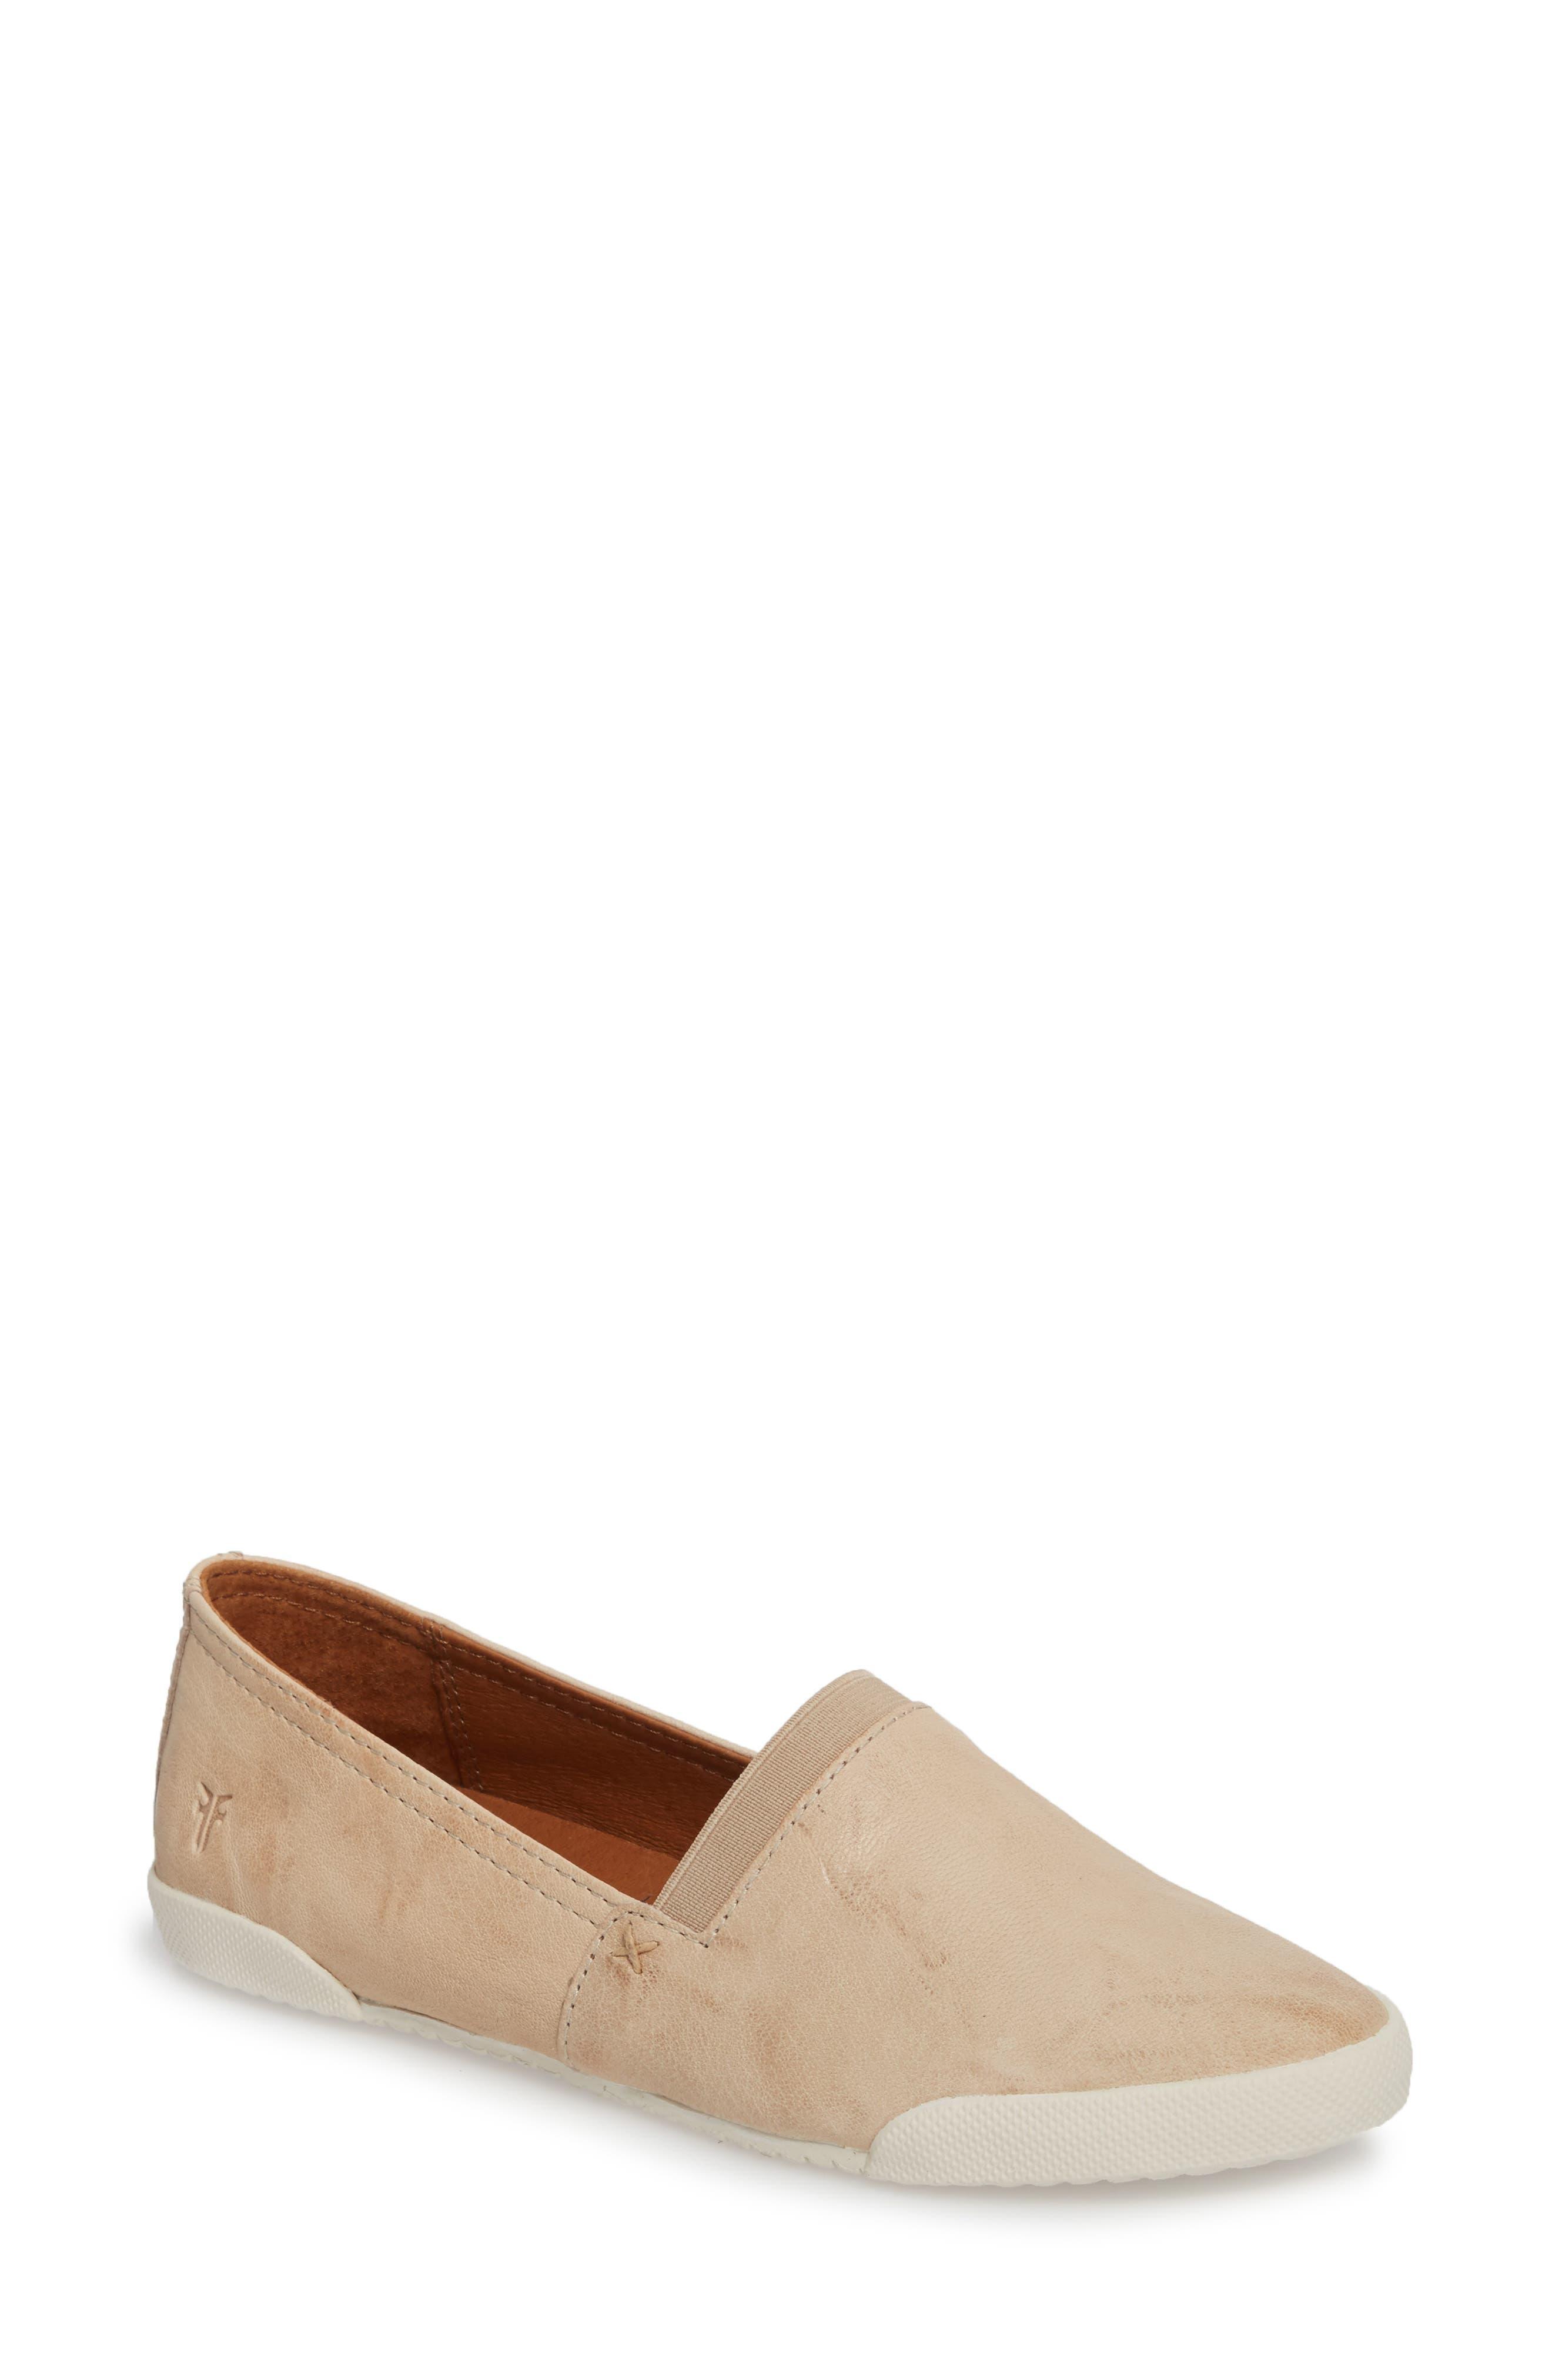 'Melanie' Slip-On,                         Main,                         color, Cream